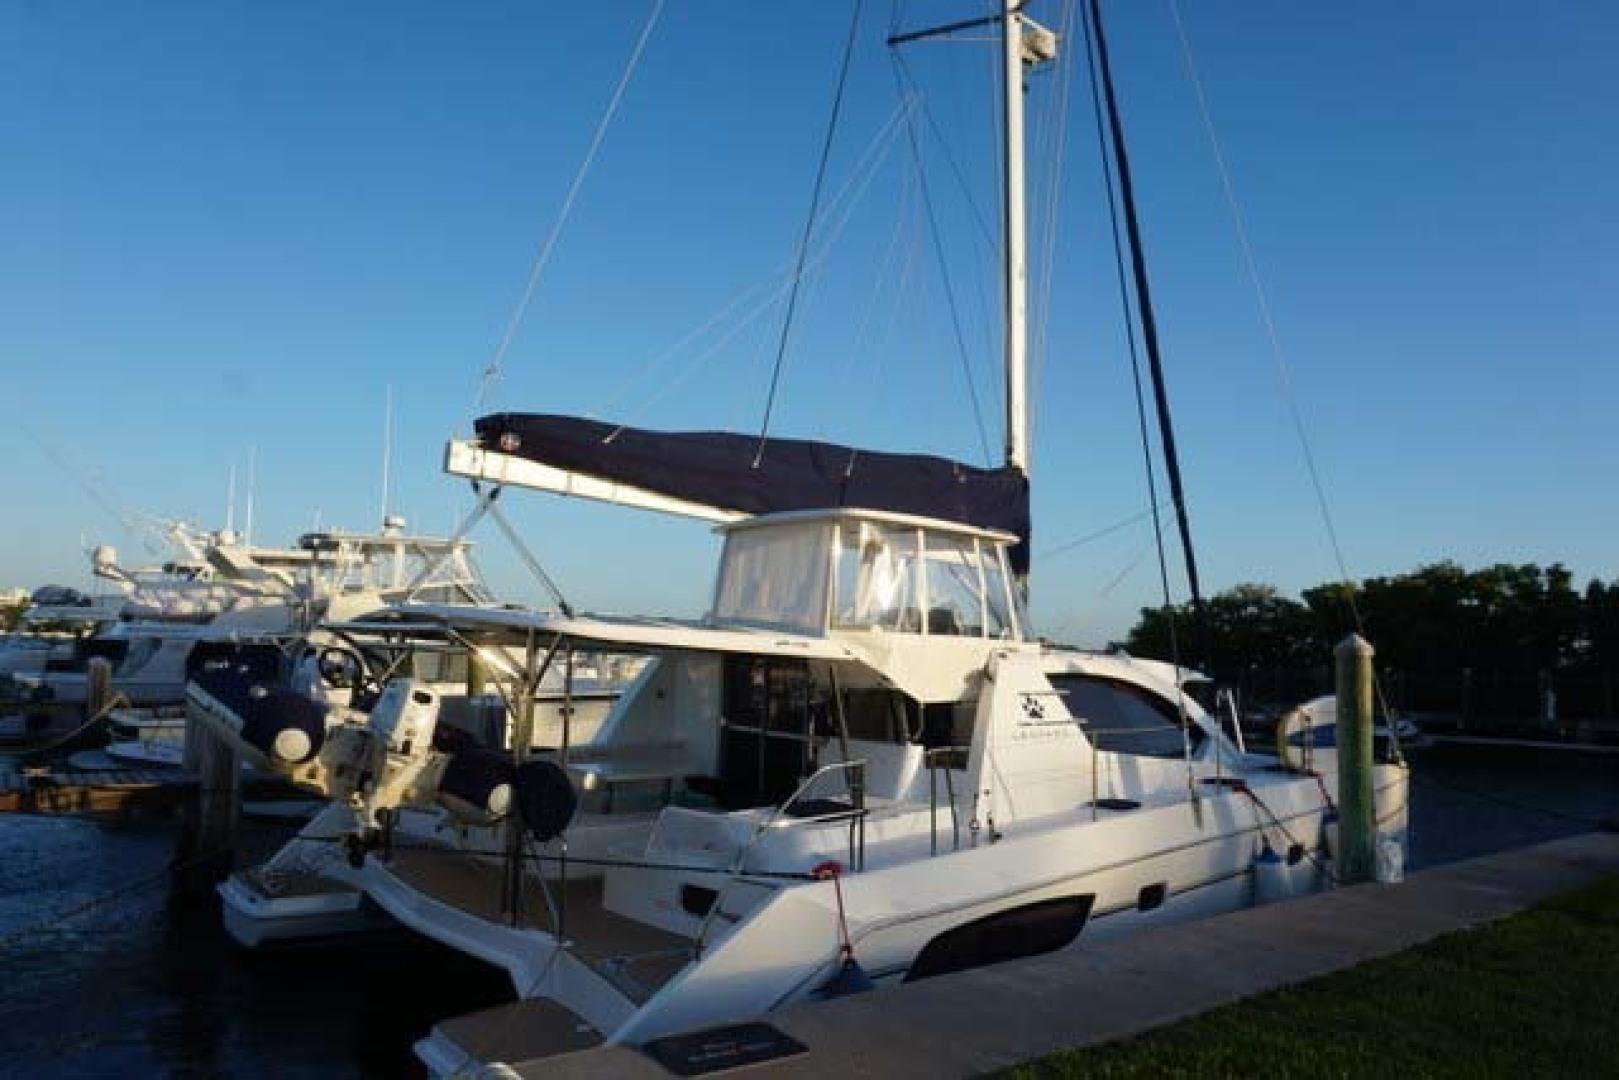 Leopard-44 2016-Grateful Fort Lauderdale-Florida-United States-Starboard Aft Profile-1471255 | Thumbnail